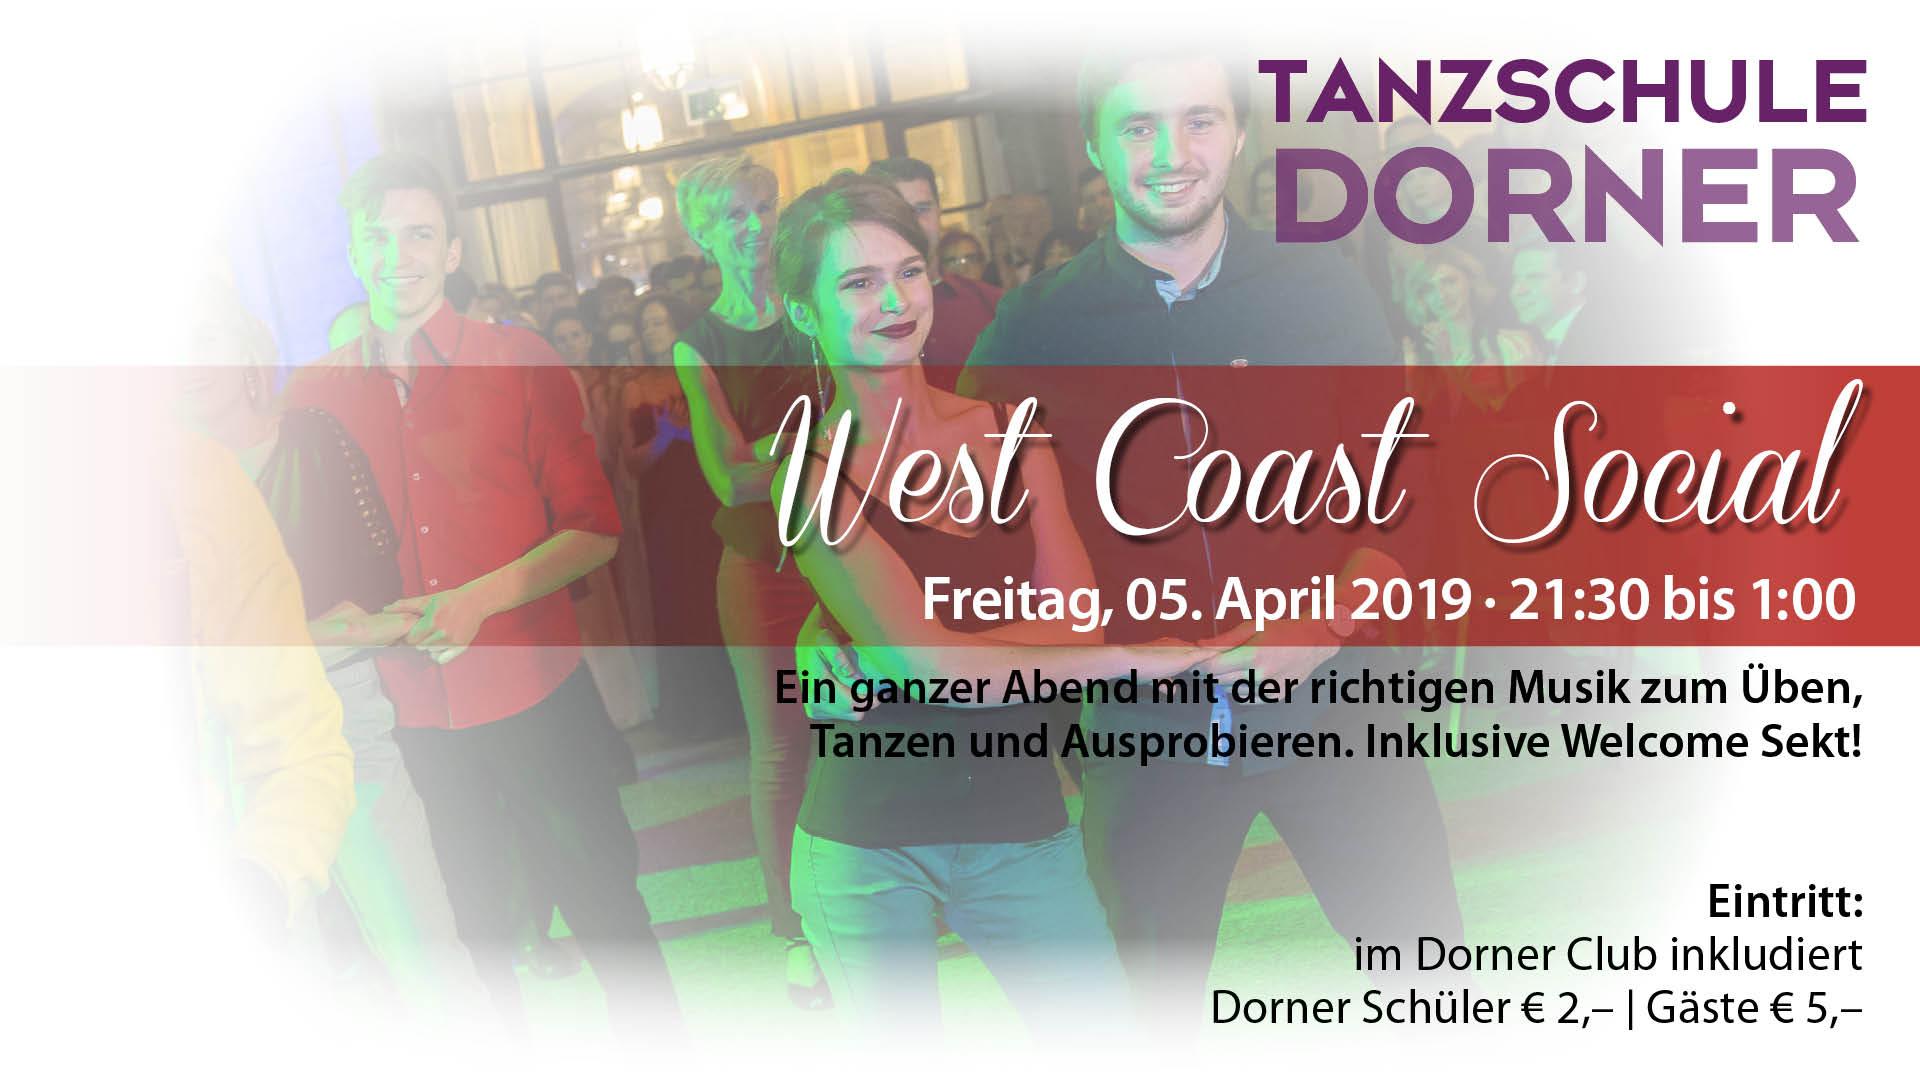 Tanzdorner West Coast Swing 05.04.2019